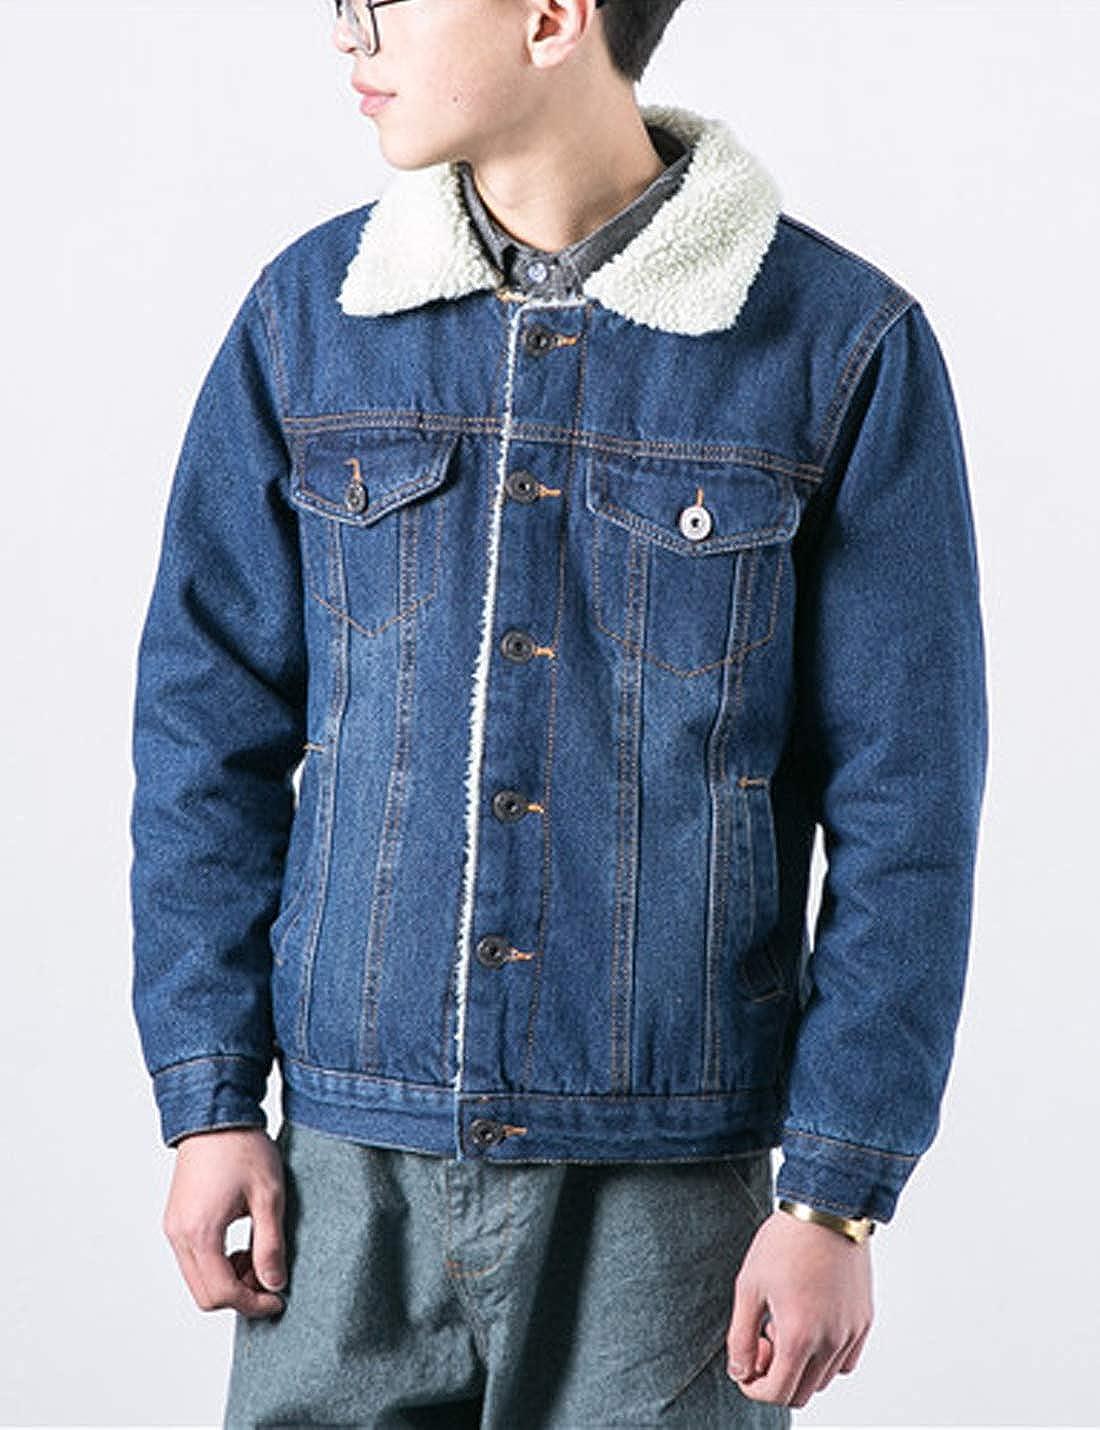 Yeokou Mens Vintage Slim Sherpa Lined Shearling Corduroy Trucker Jacket